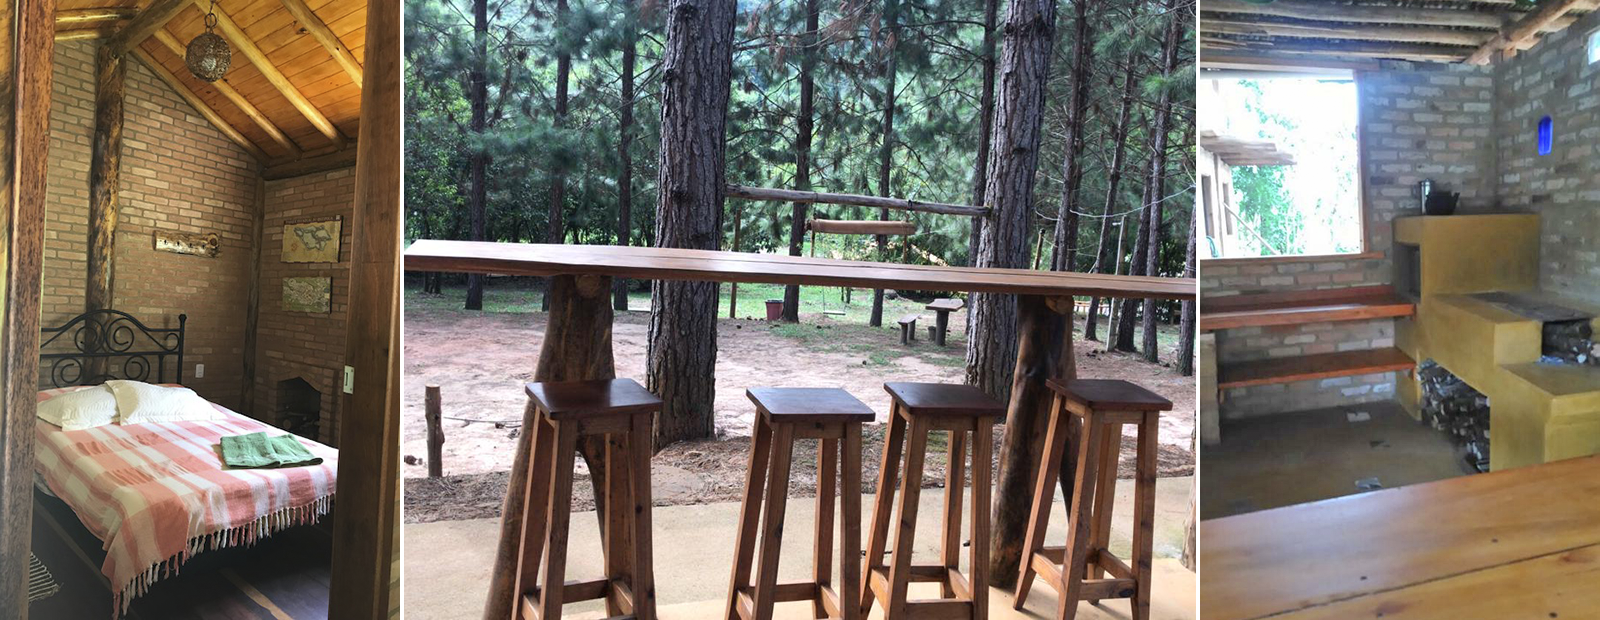 Camping dos Pinheiros